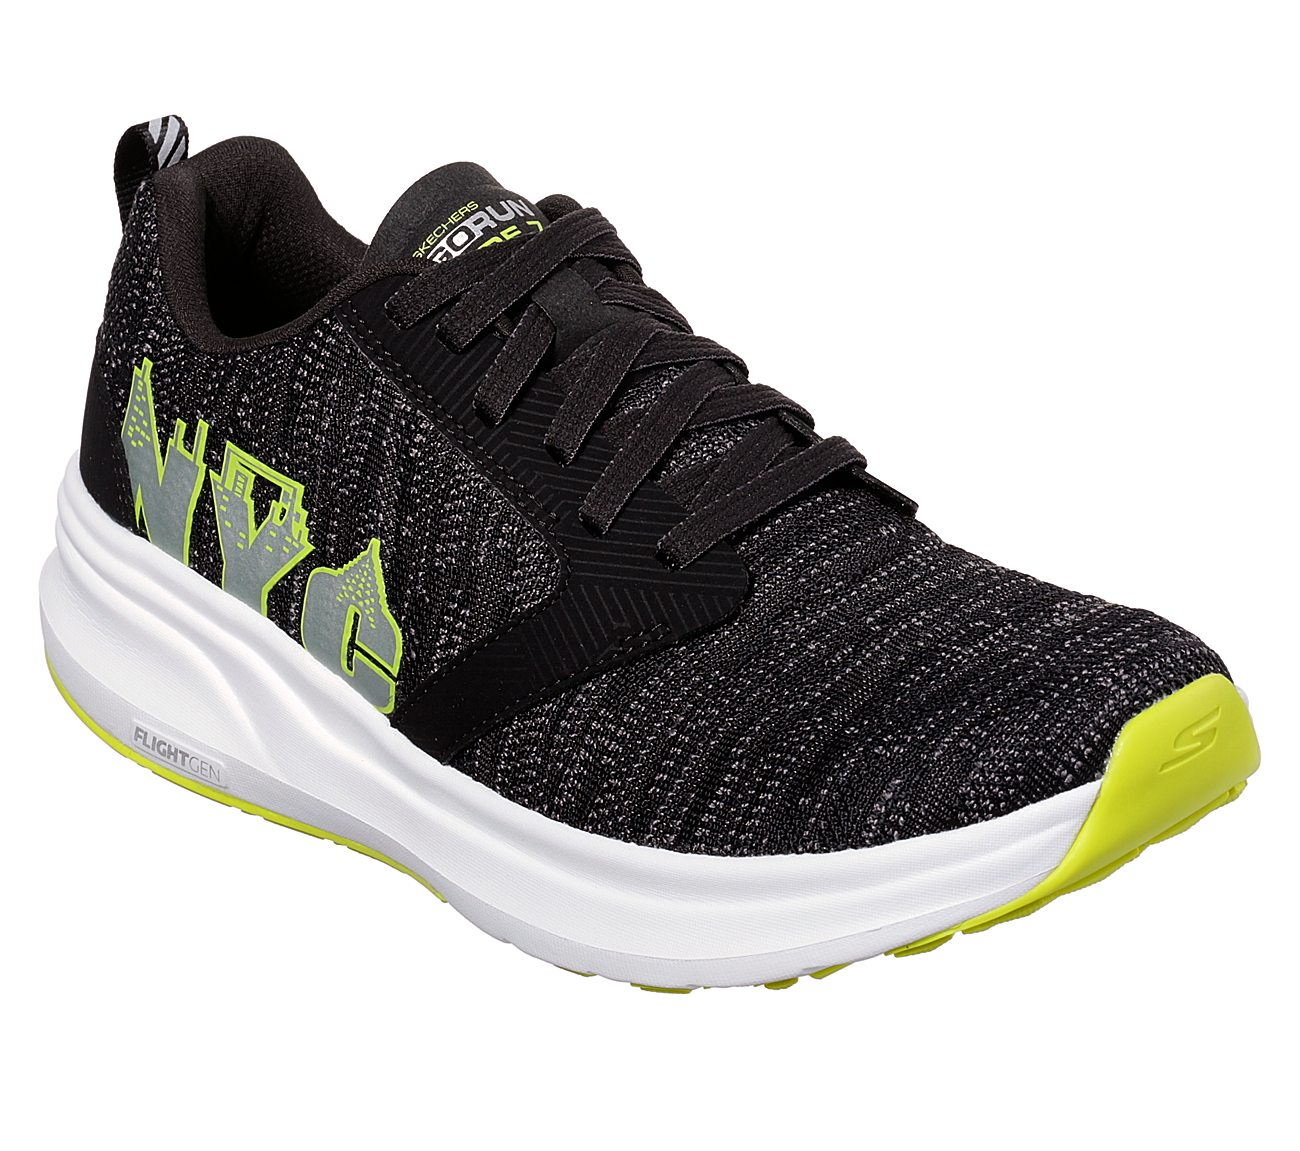 skechers shoes for women 2018